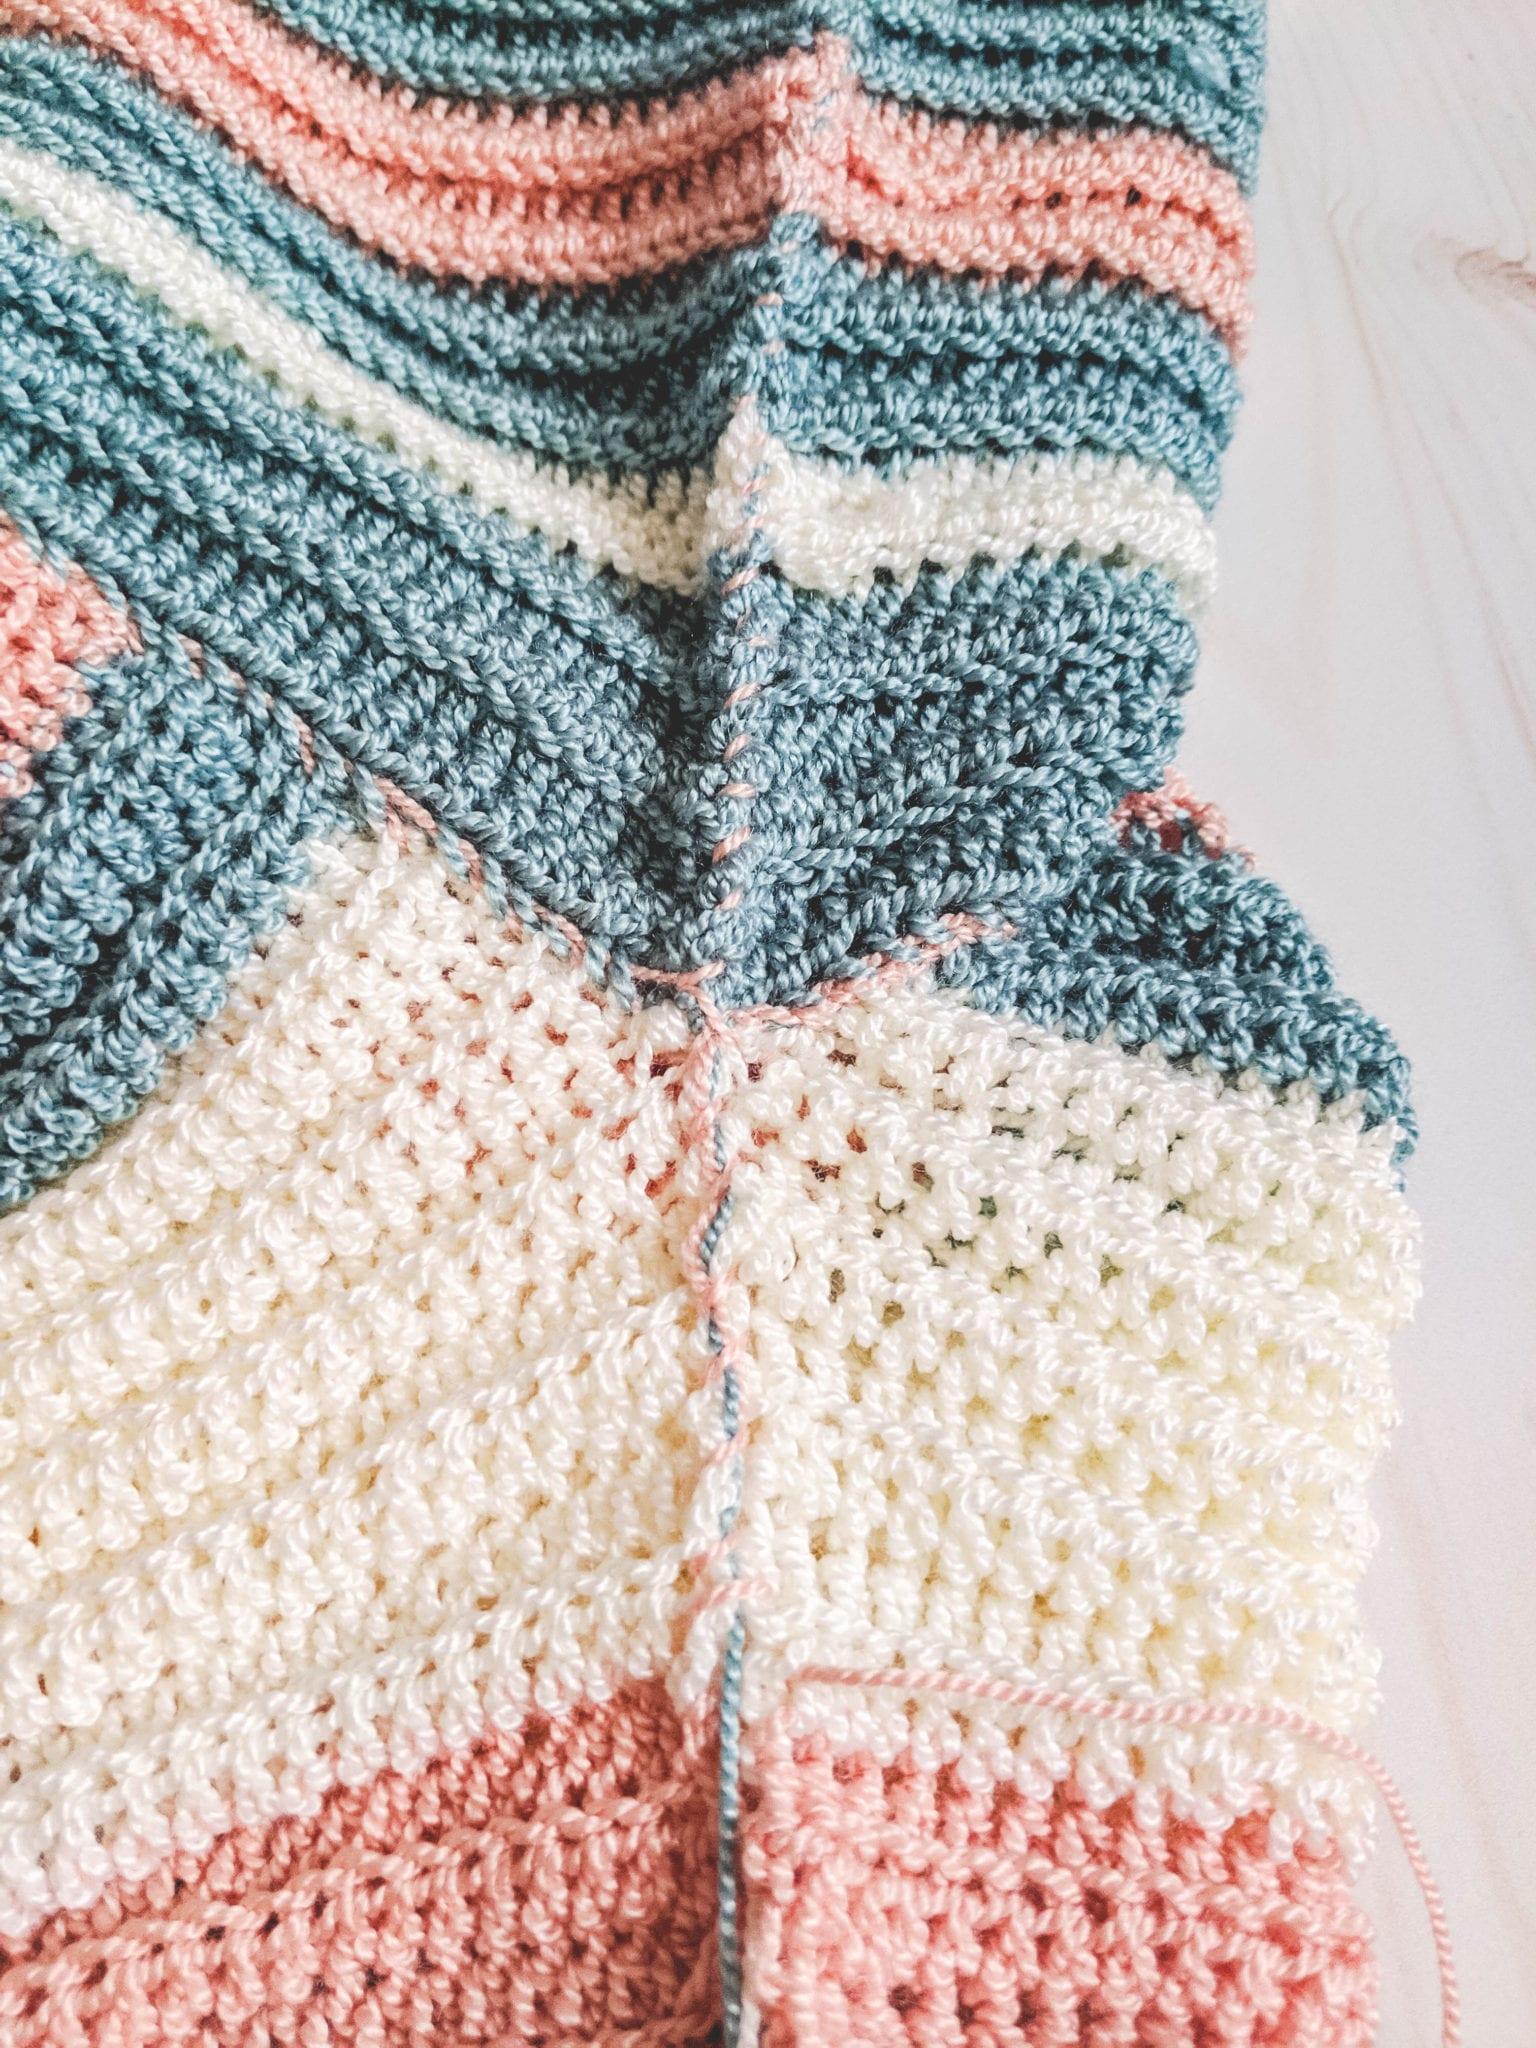 Crochet Magic Stripe Sweater - Sewrella